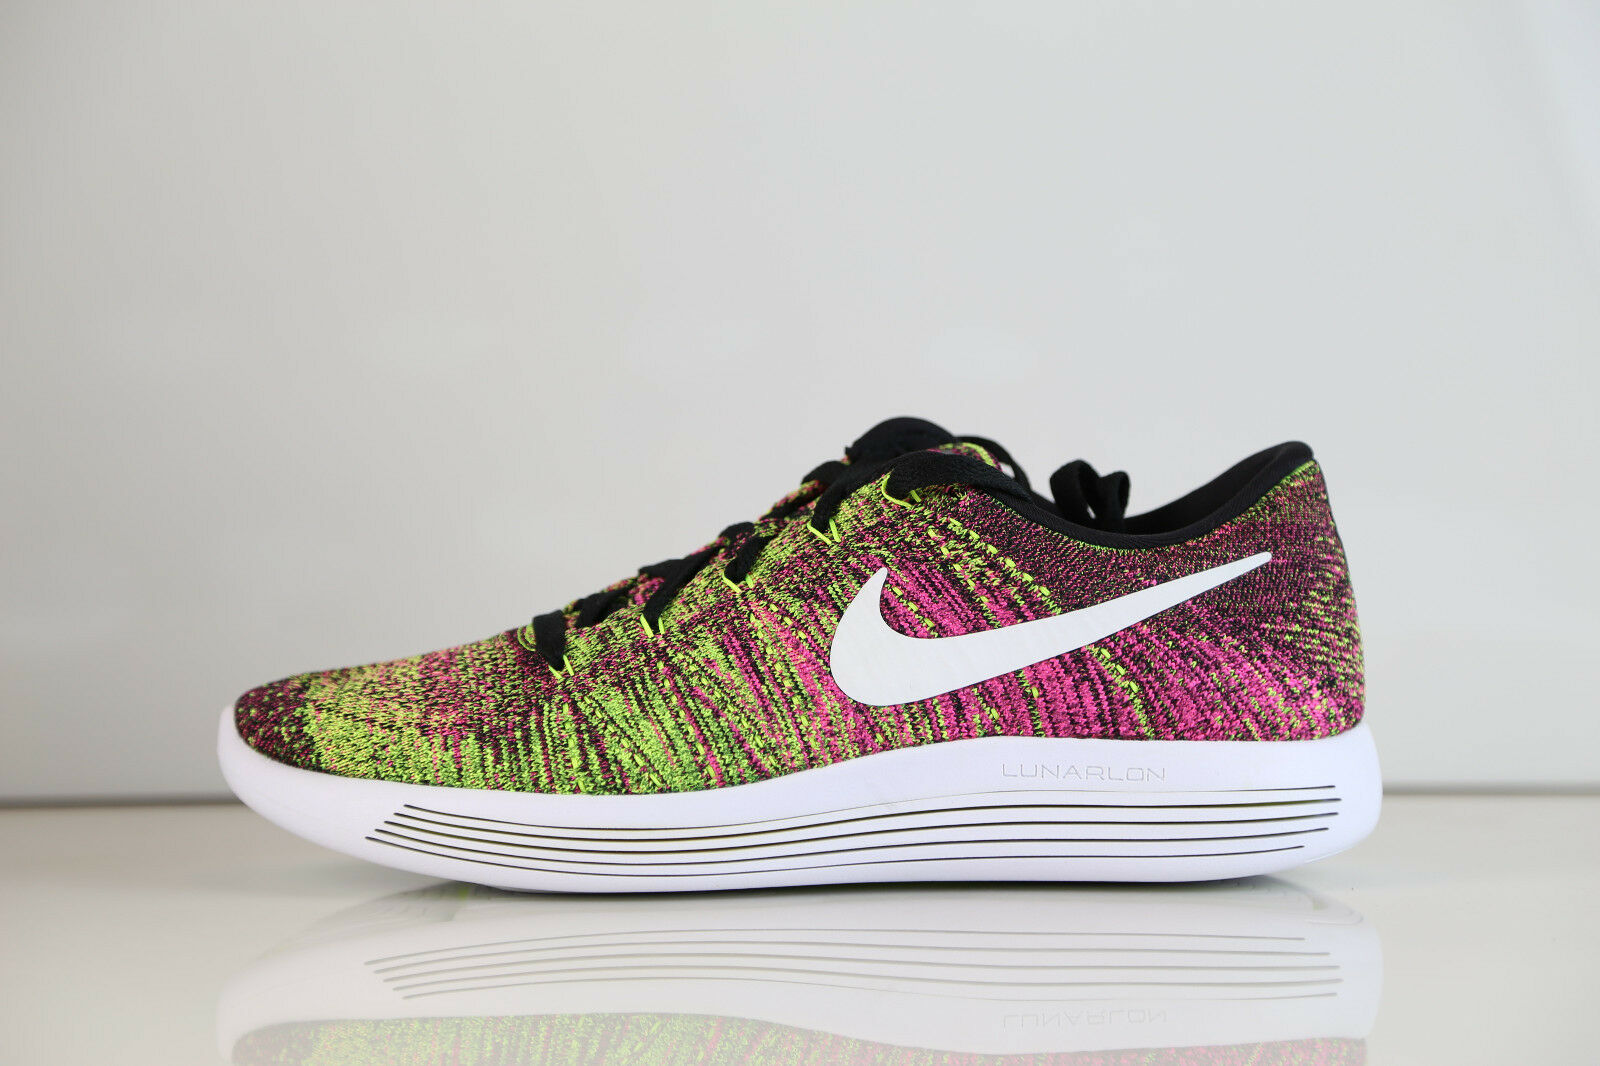 Nike LunarEpic Low Flyknit OC Multicolor 844862-999 8-15 lunar epic multi free